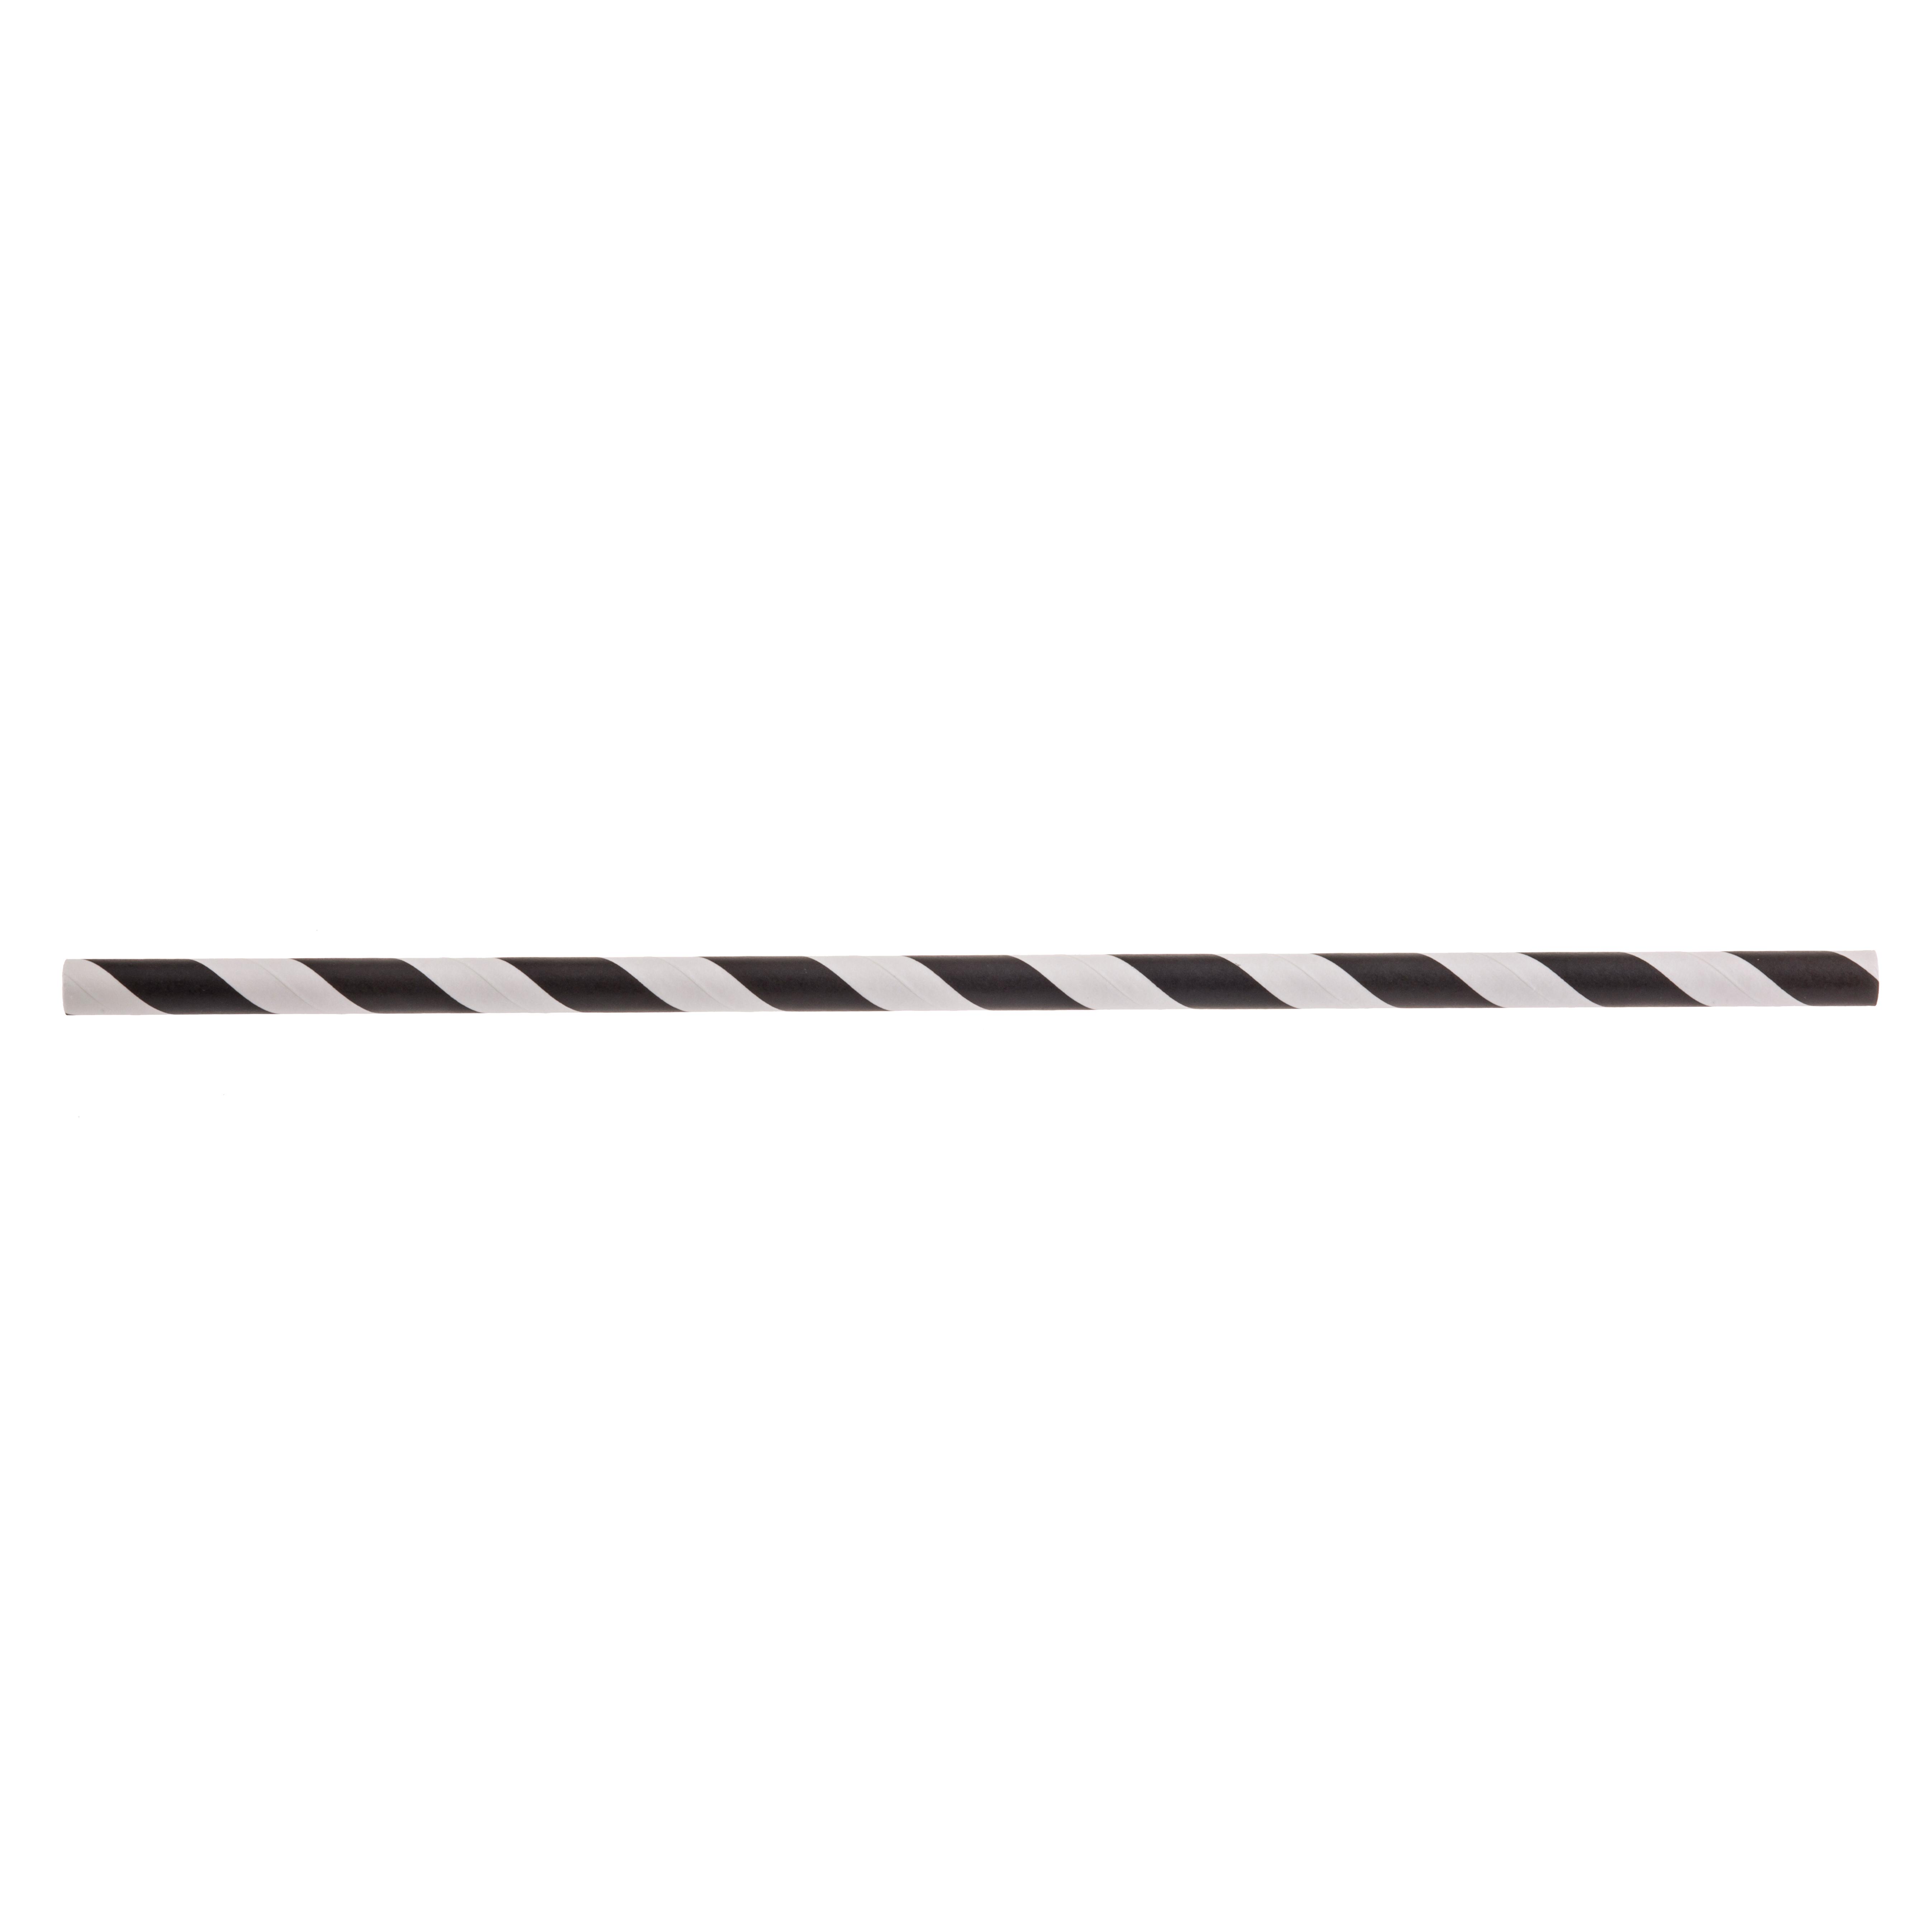 TableCraft Products 700113 straws